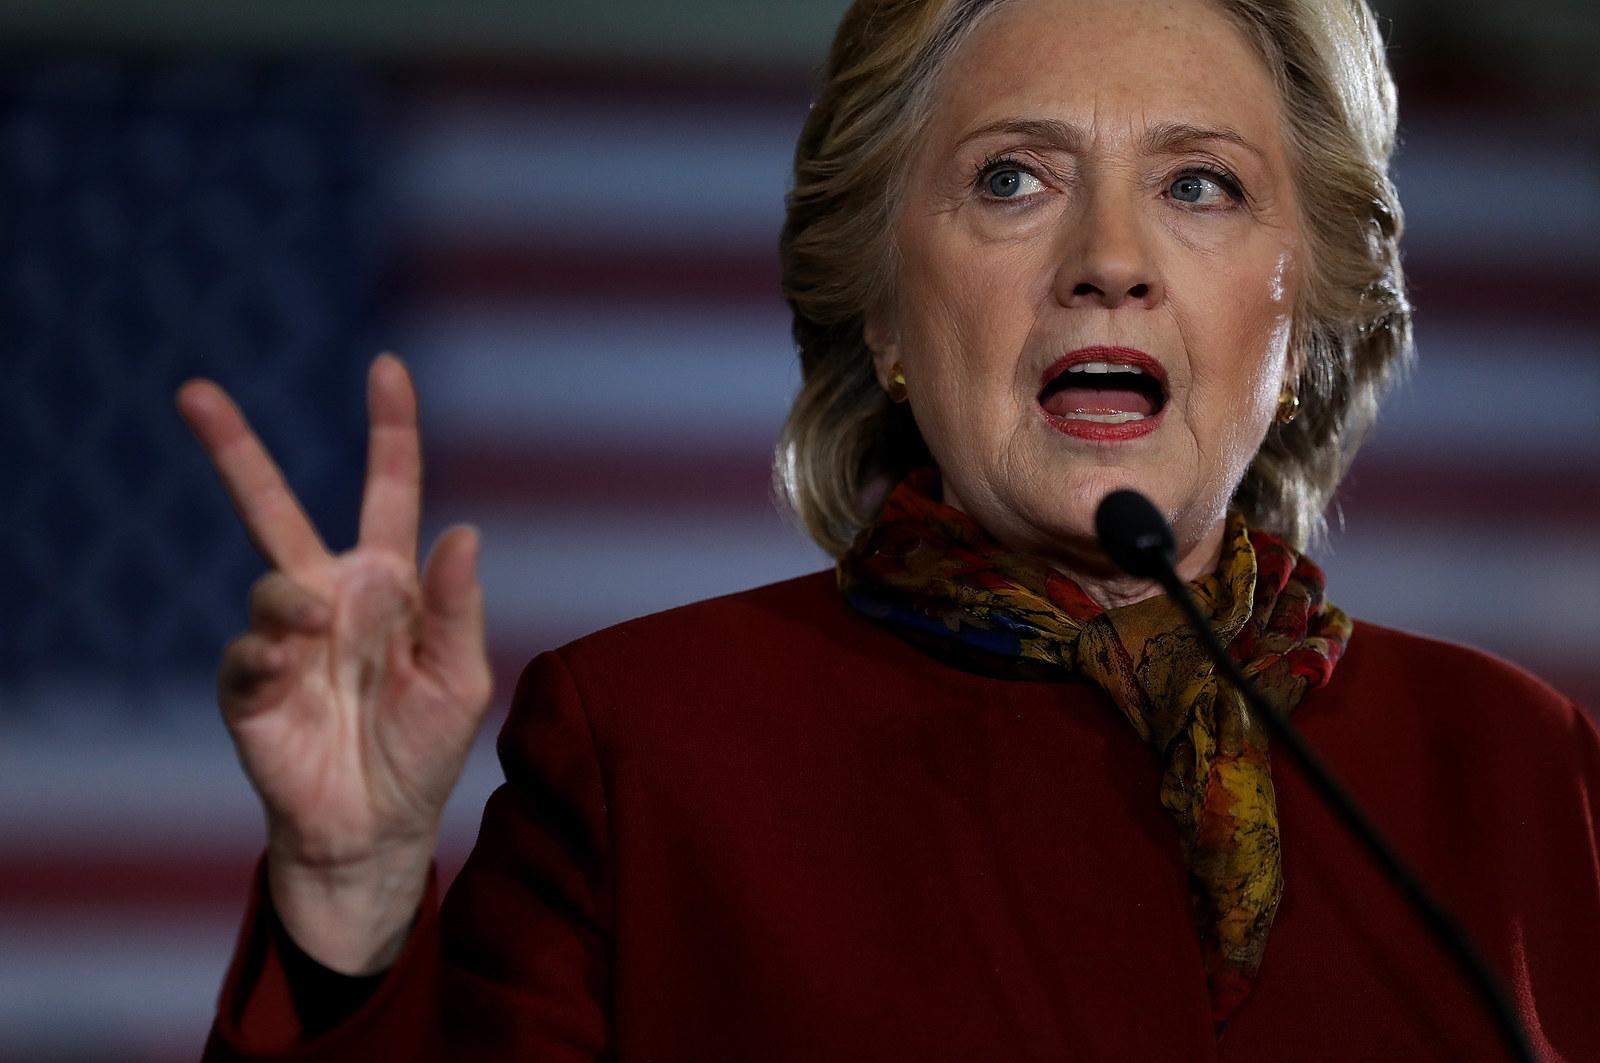 A First: Clinton Attacks A Down-Ballot Republican